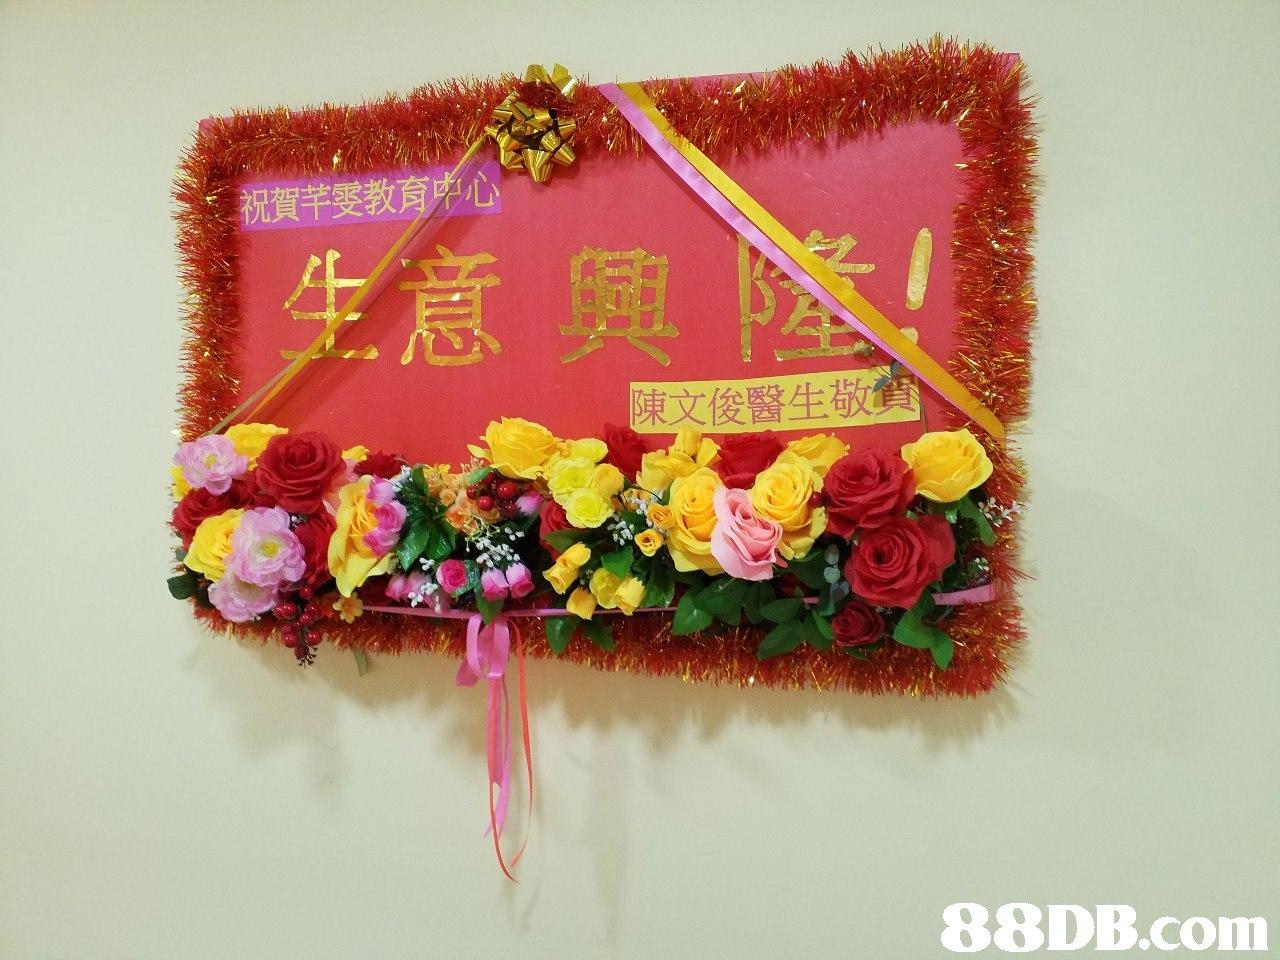 陳文俊醫生敬 88DB.com  flower